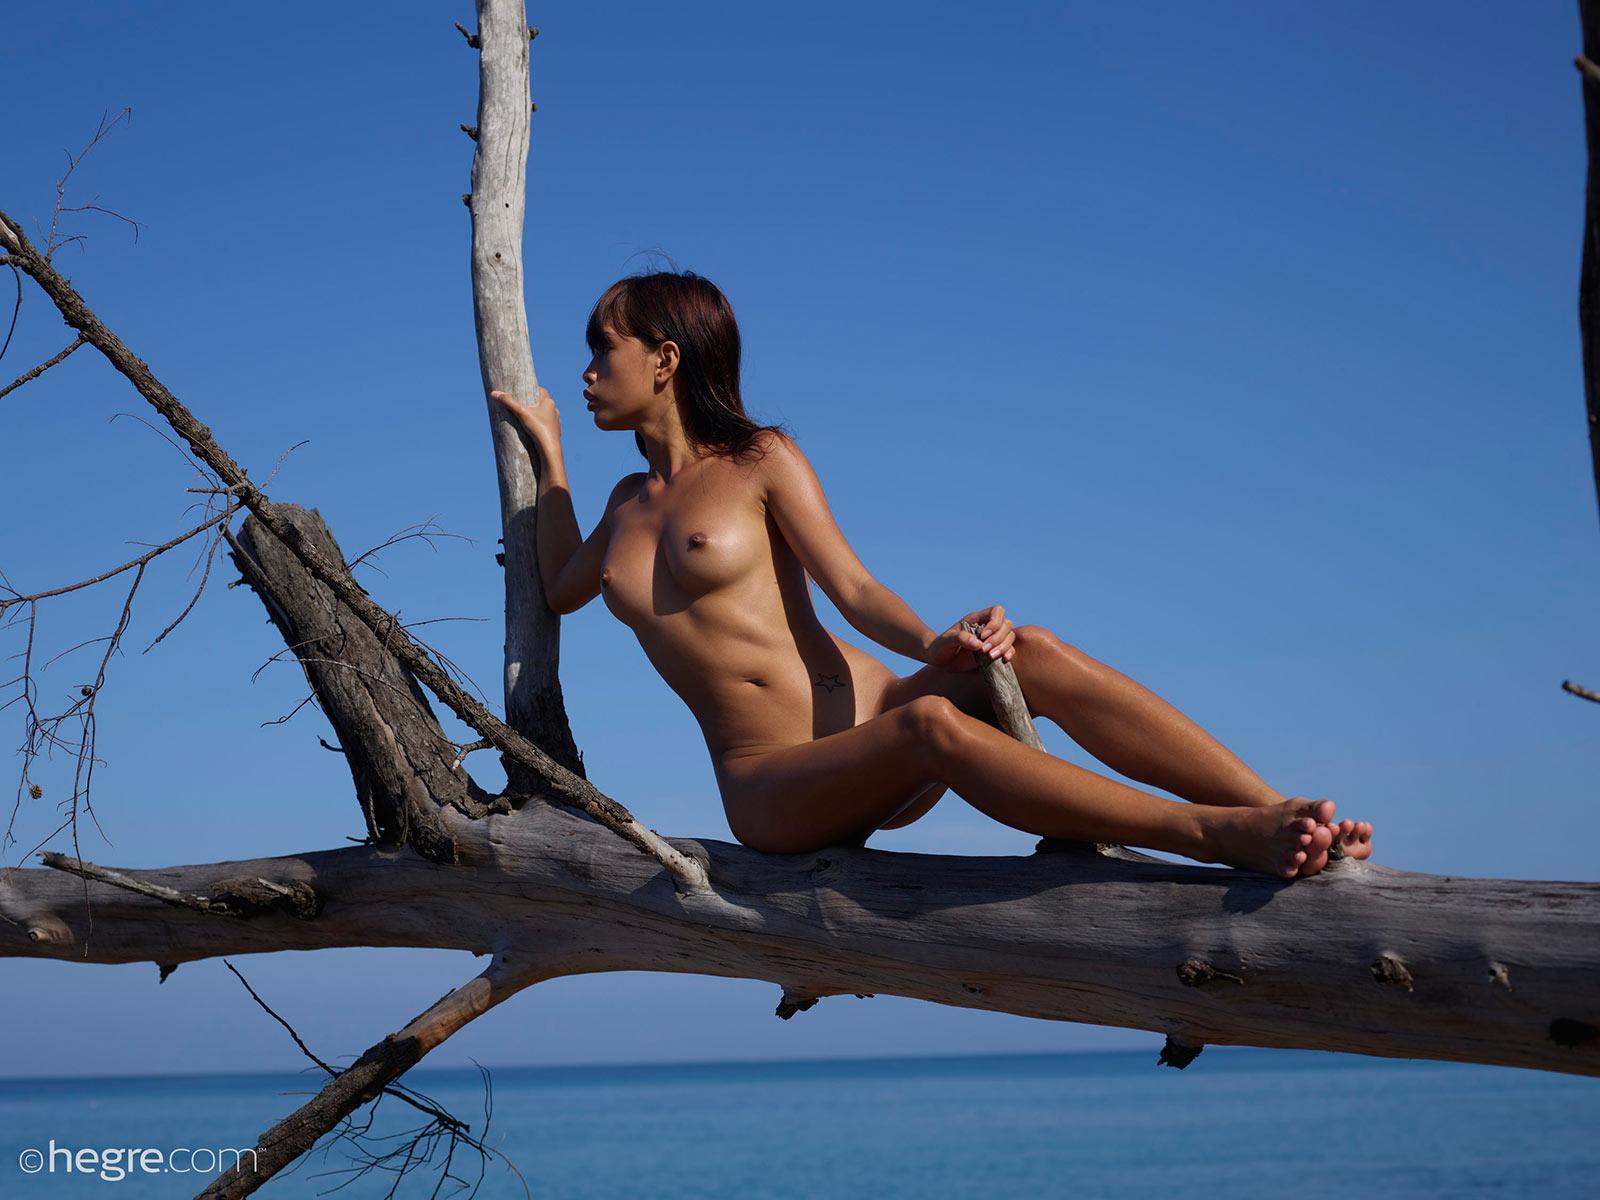 Crazy nude art